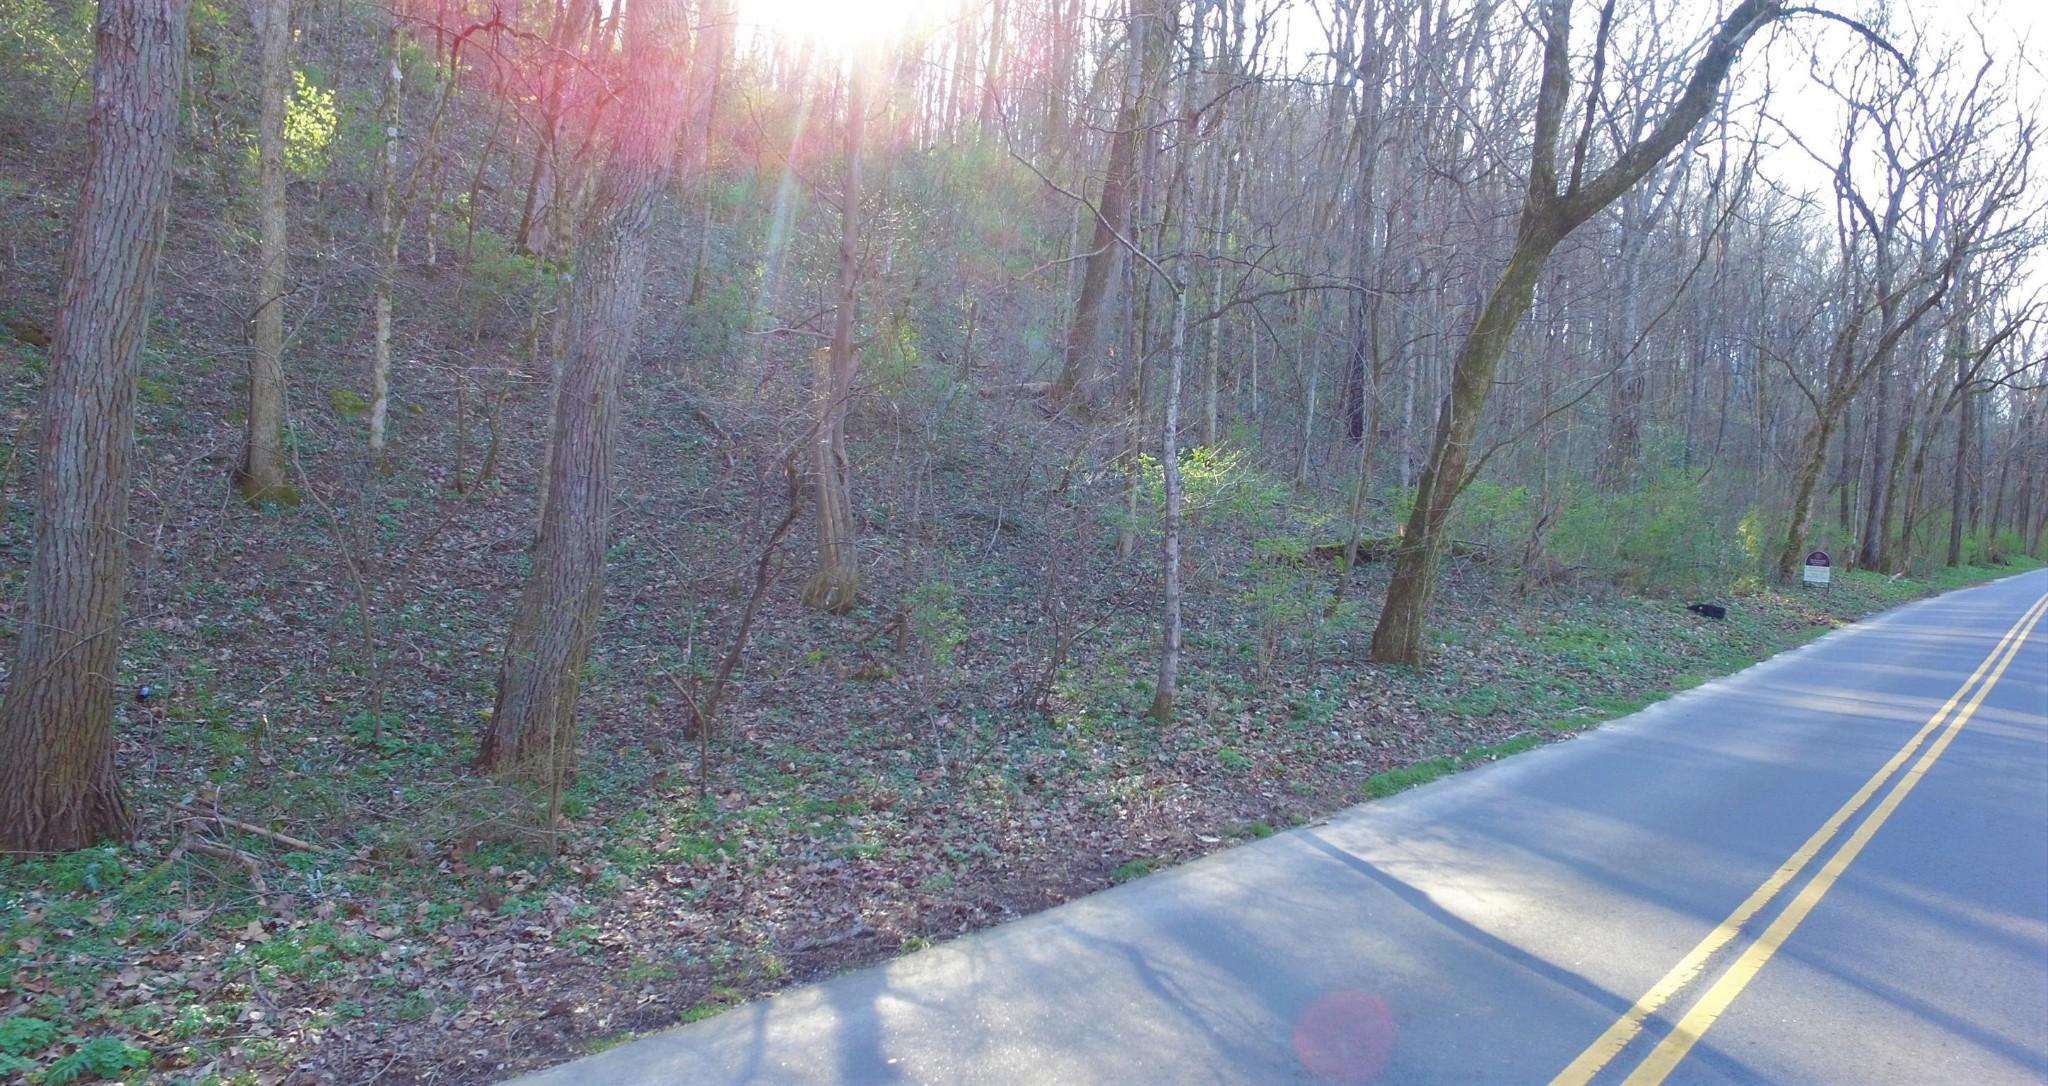 0 Dry Fork Rd, Whites Creek, TN 37189 - Whites Creek, TN real estate listing